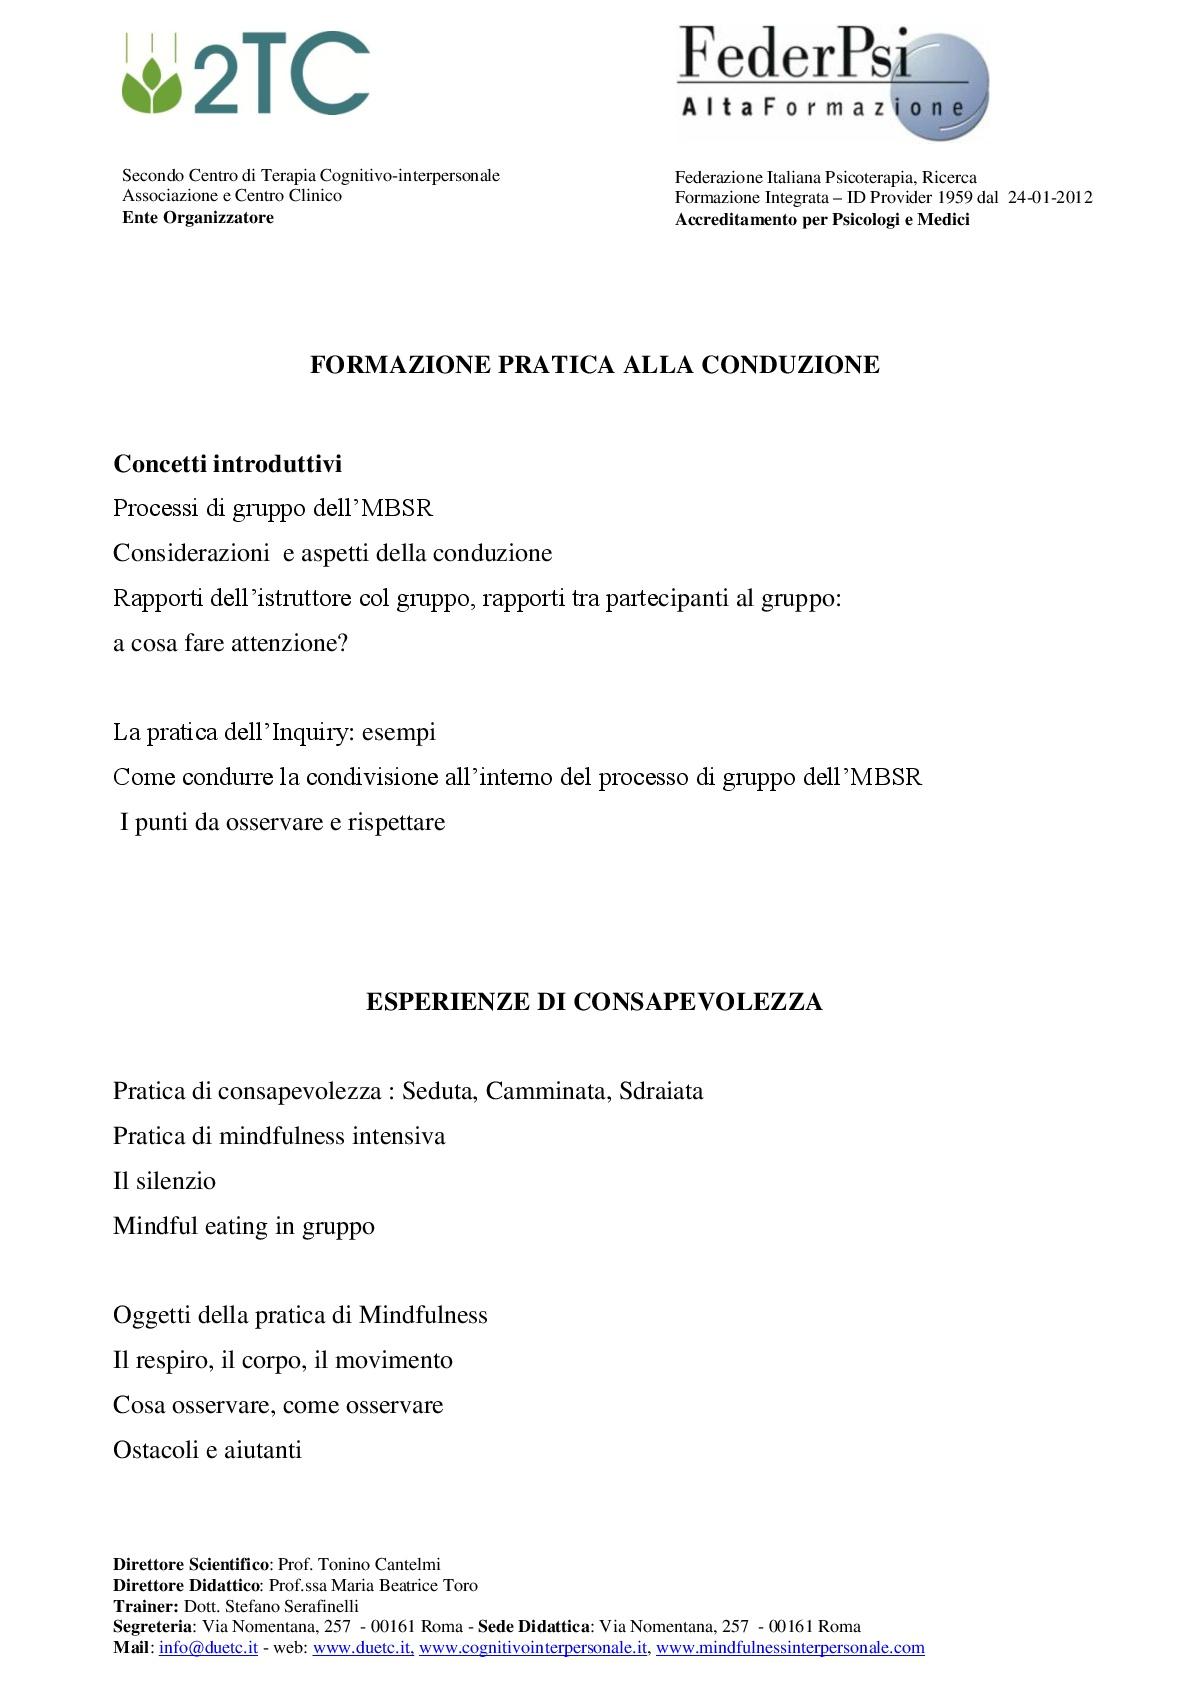 programma-Istruttore-Mindfulness-007